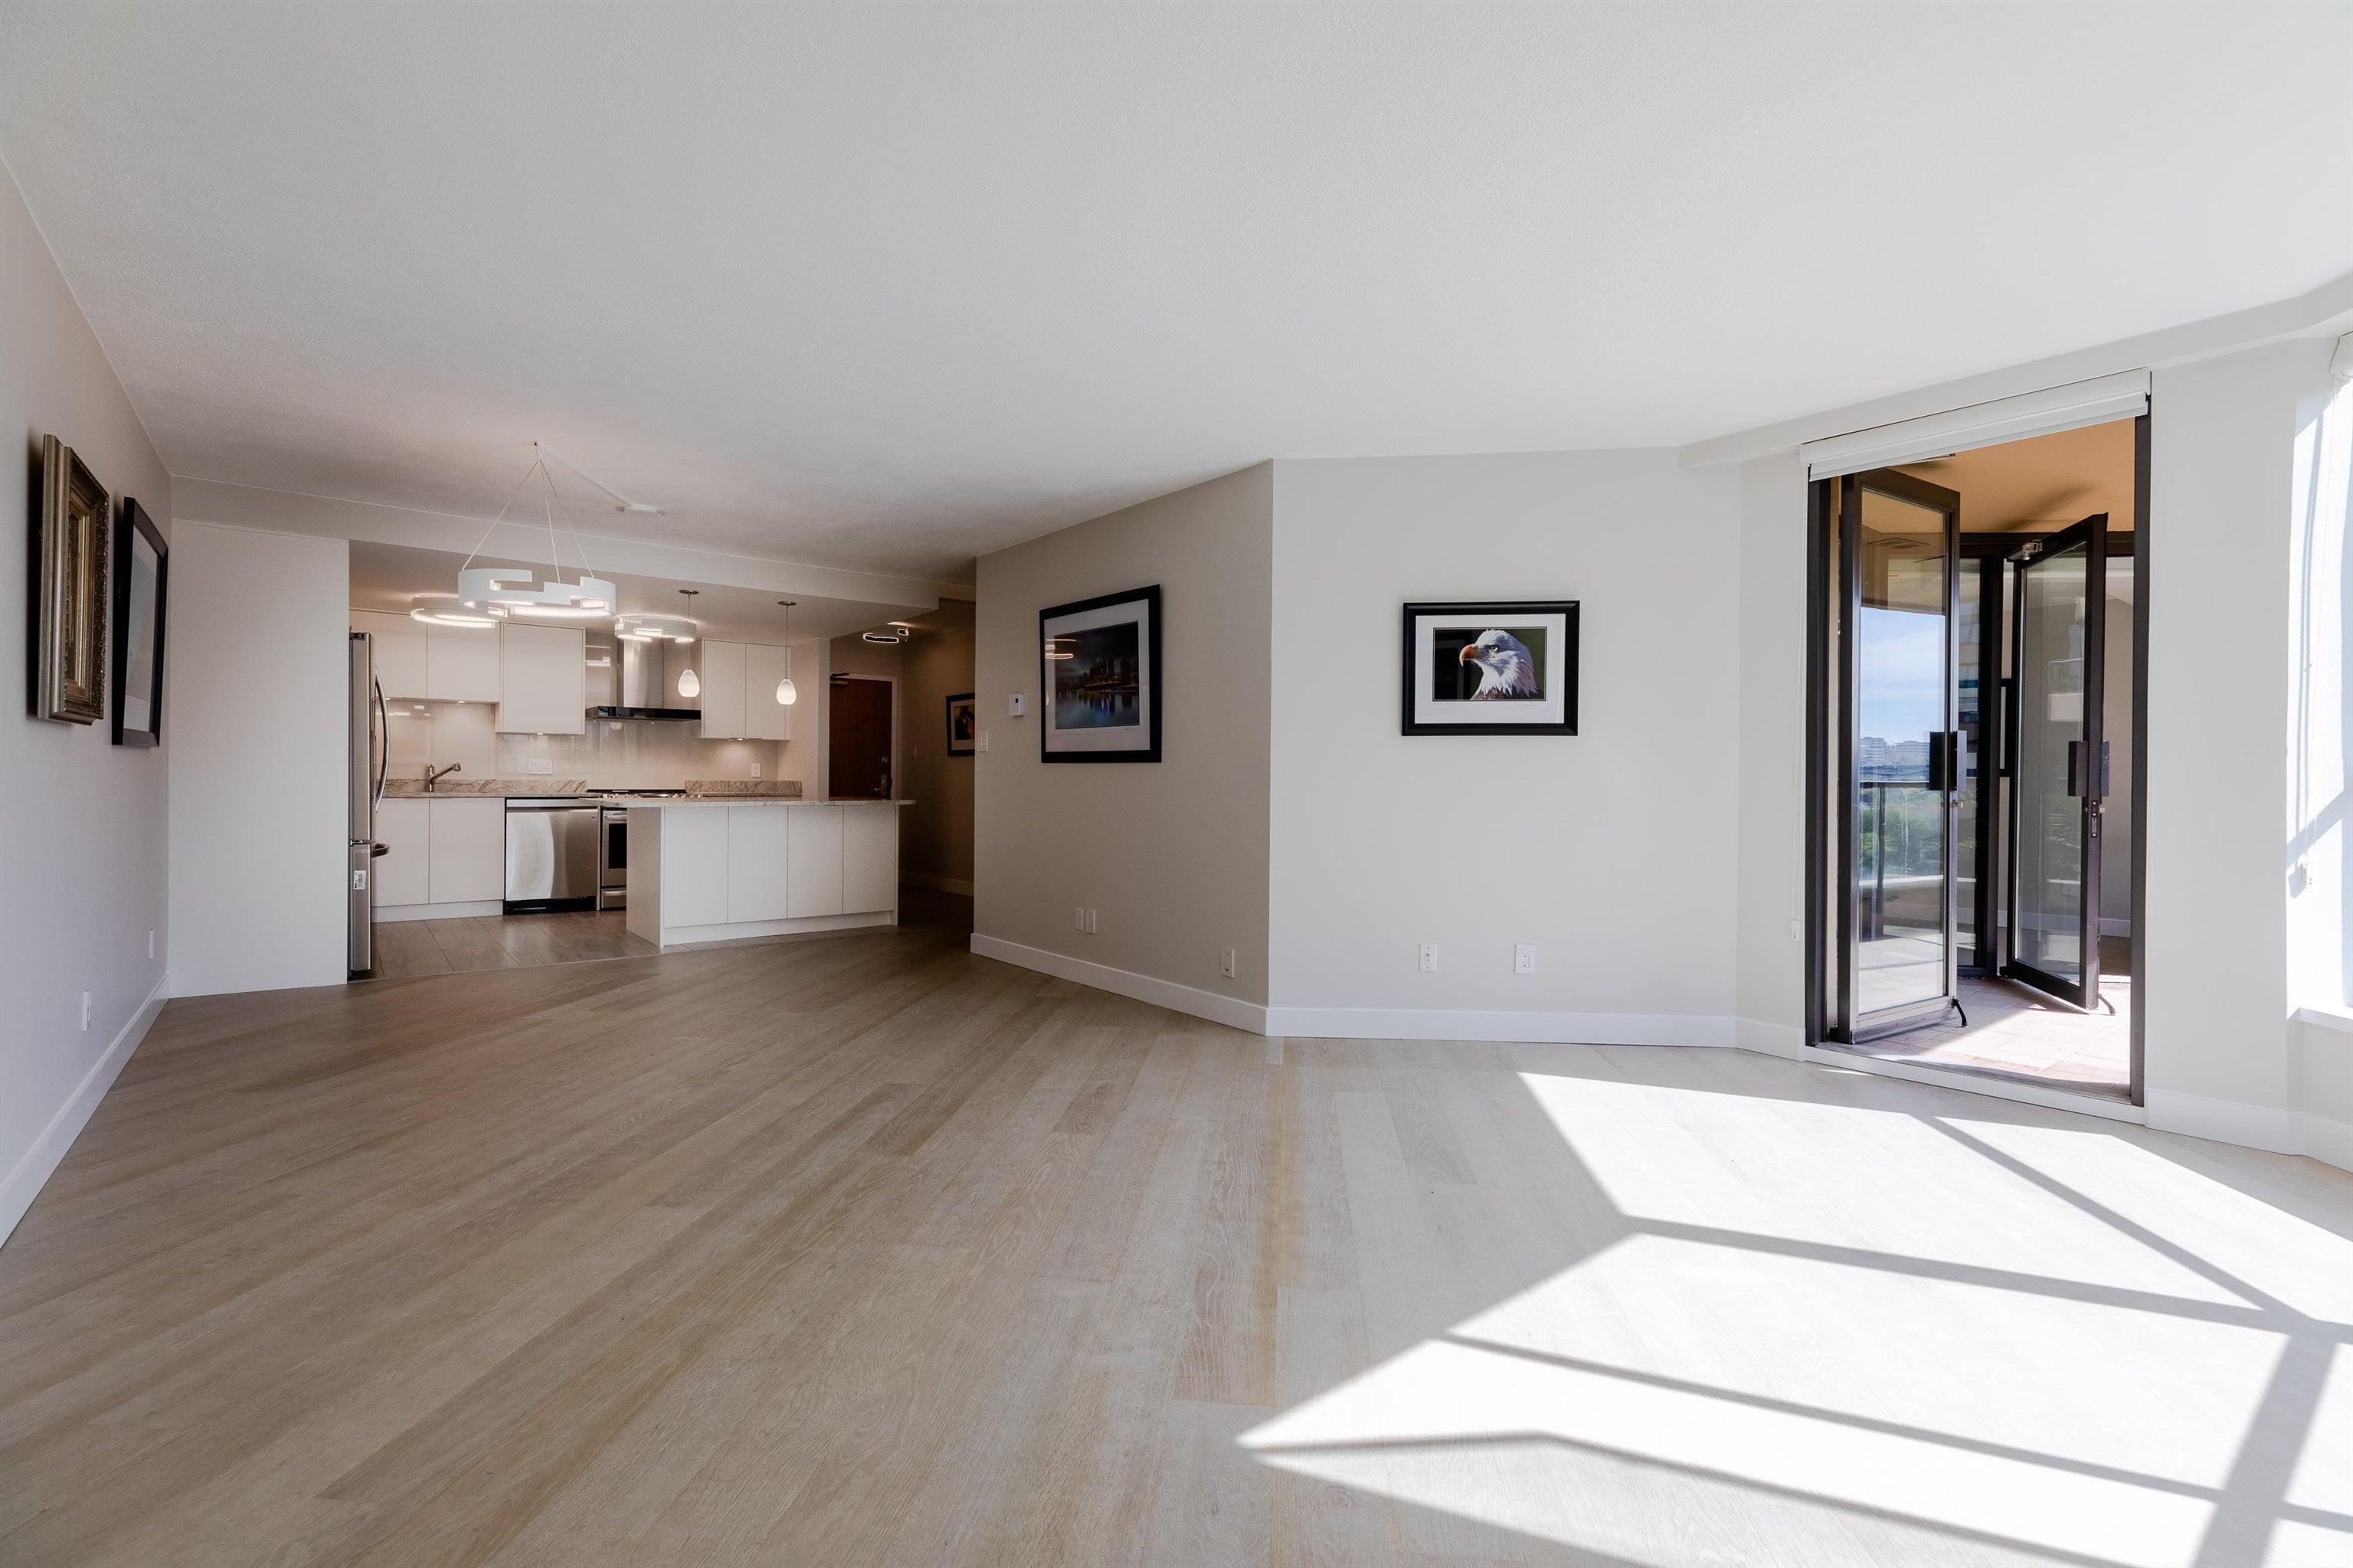 406 1450 PENNYFARTHING DRIVE - False Creek Apartment/Condo for sale, 2 Bedrooms (R2617259) - #20